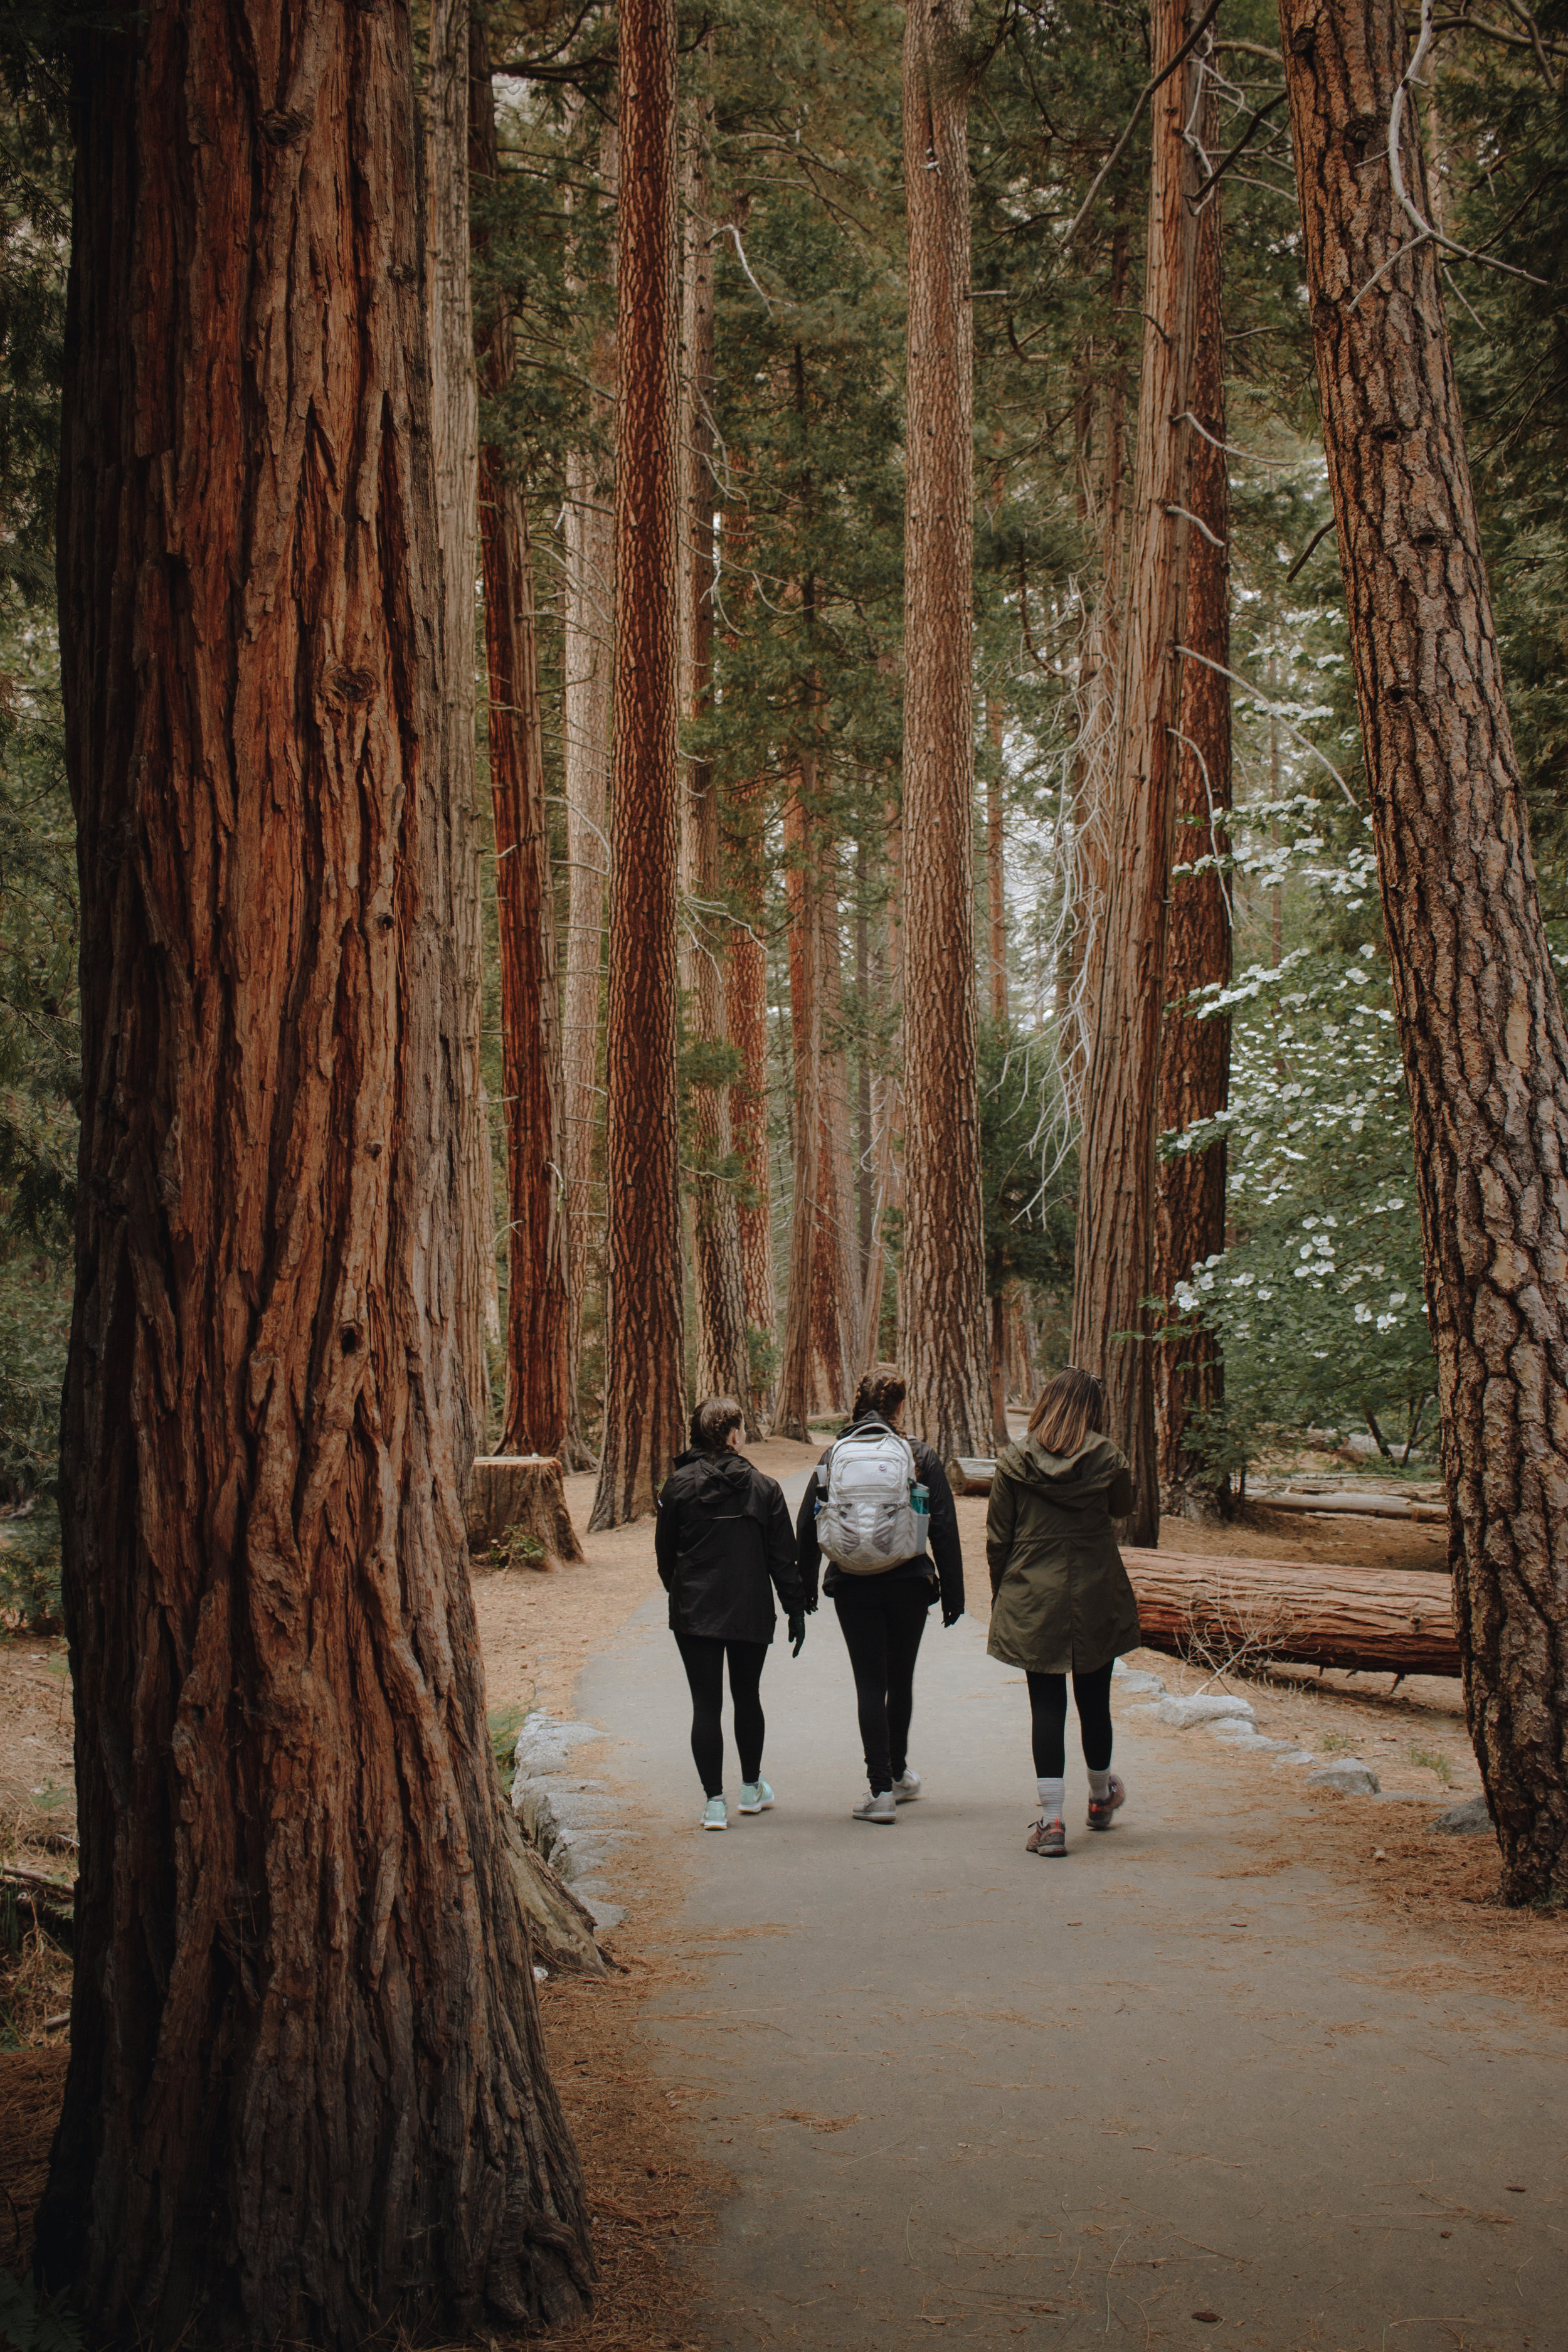 The walk to Lower Yosemite Falls